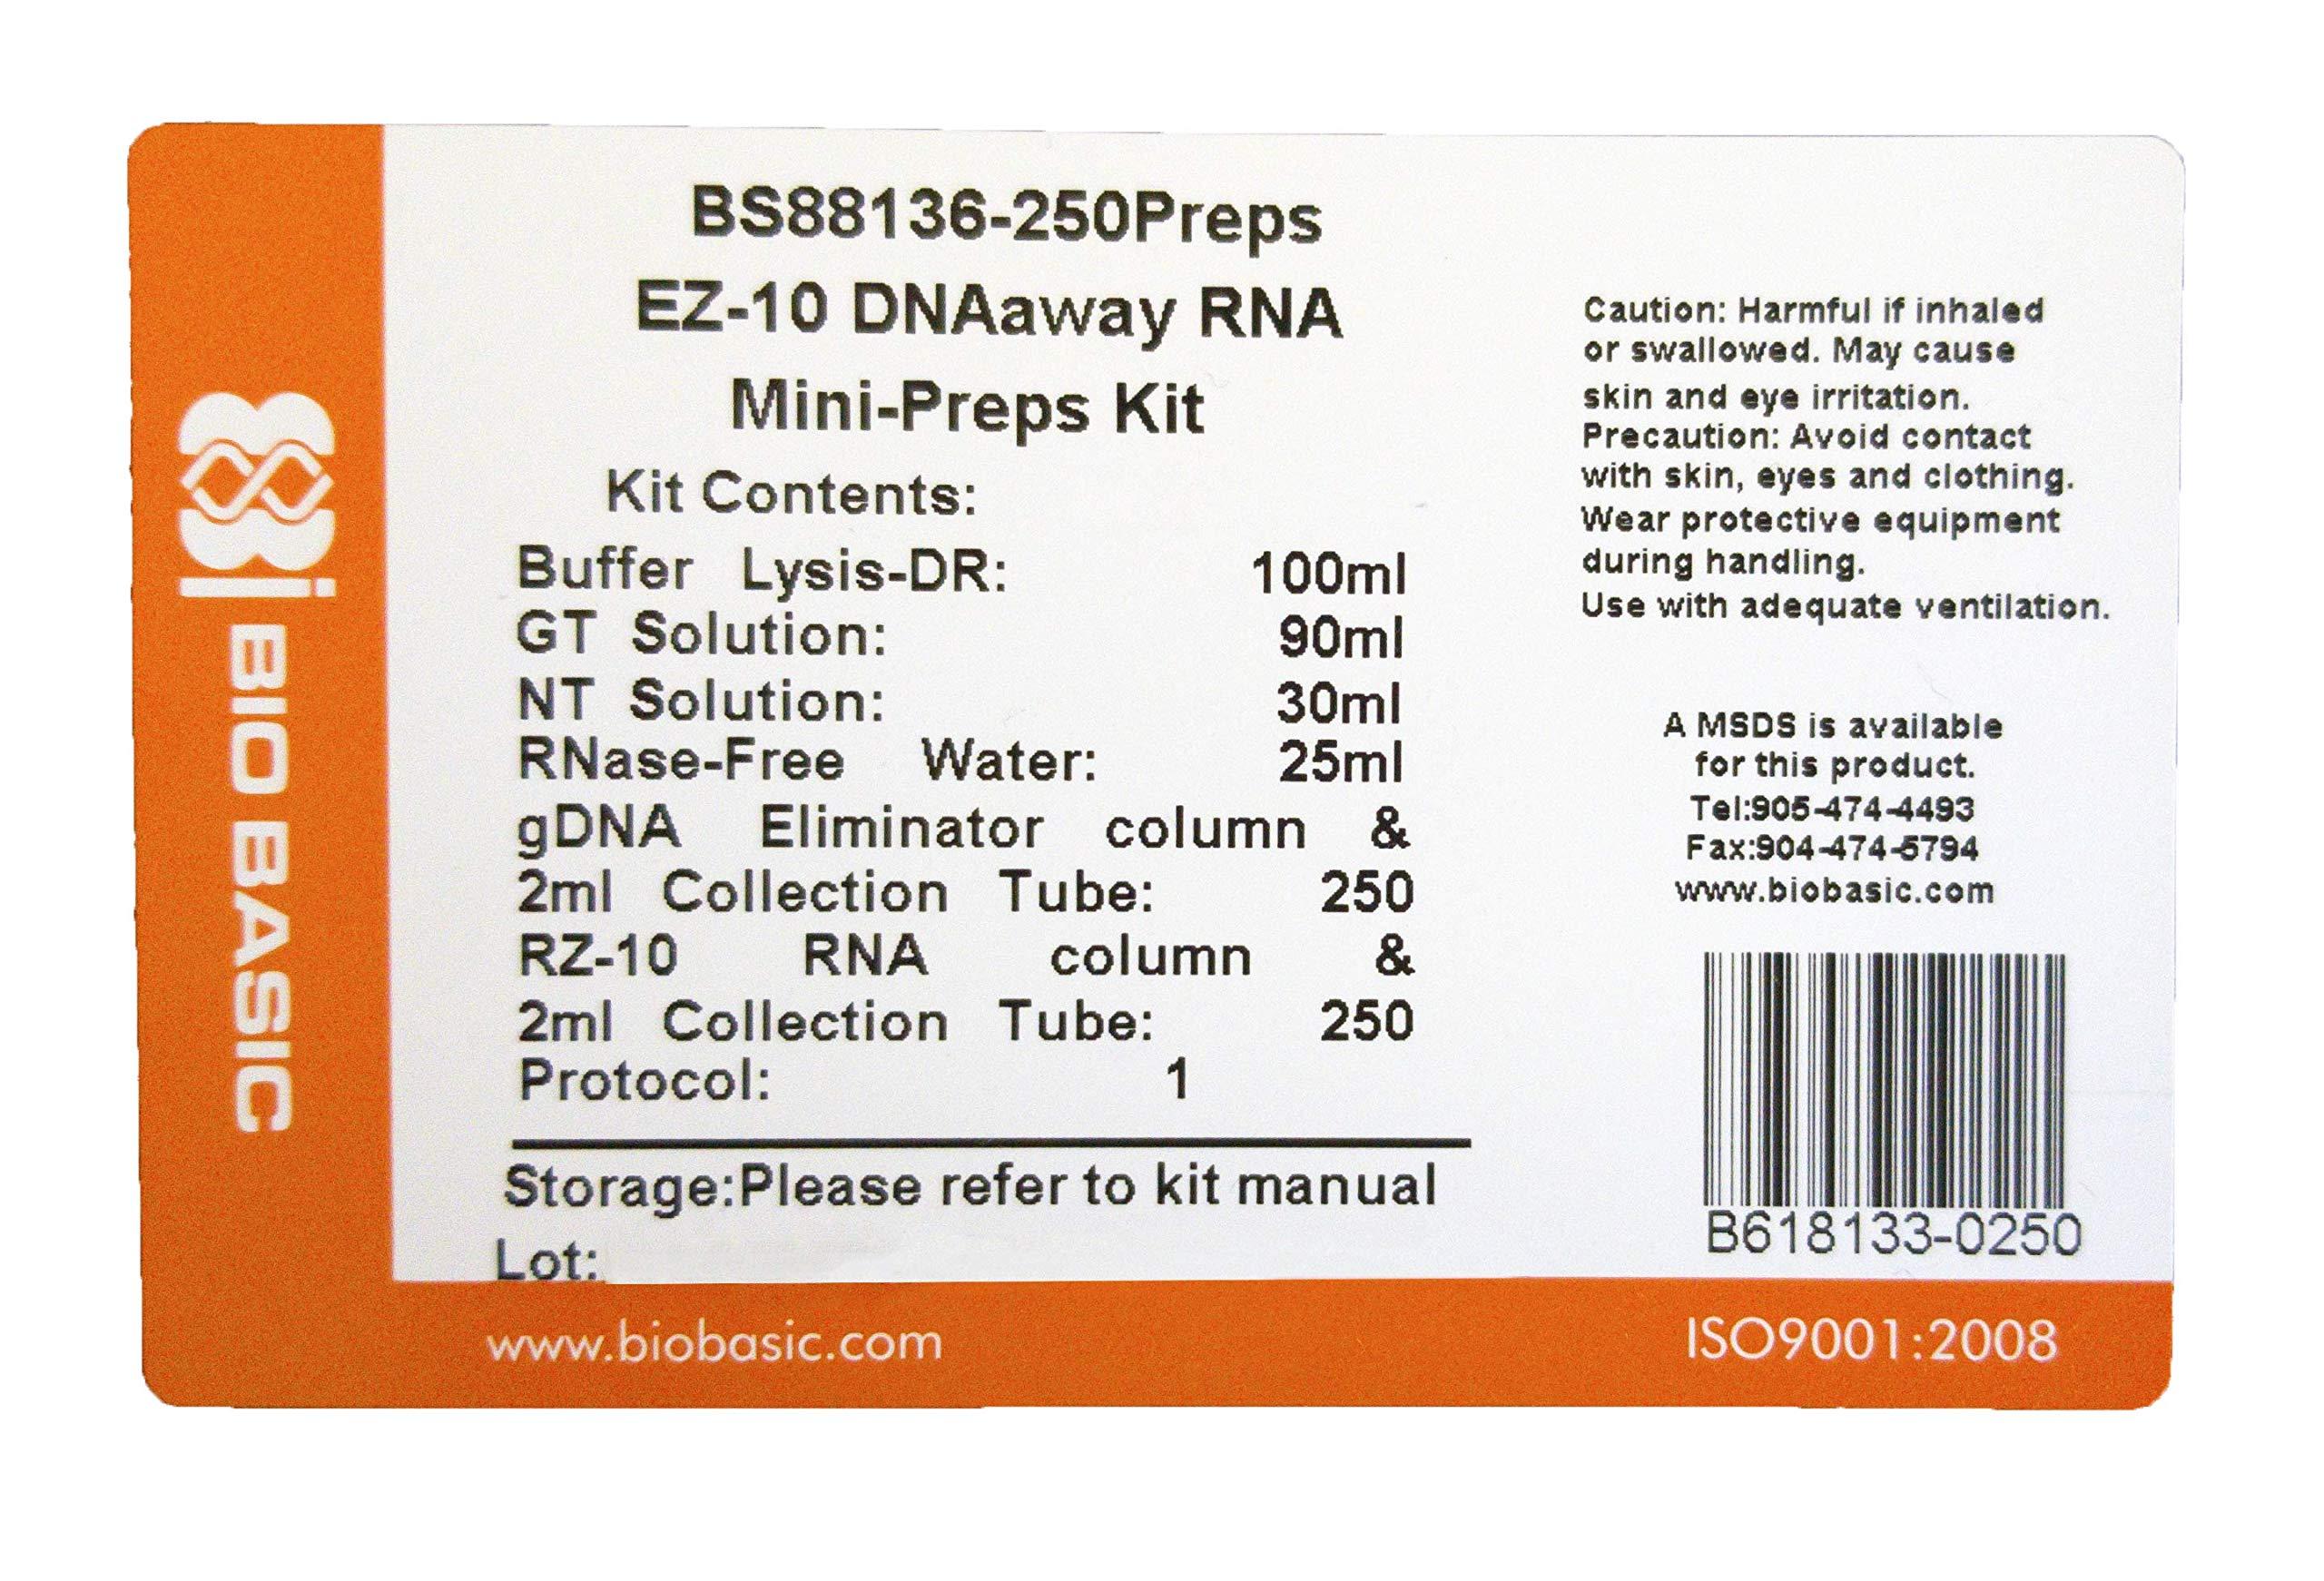 EZ-10 DNAaway RNA Miniprep Kit, 250 Preparations by Bio Basic (Image #2)